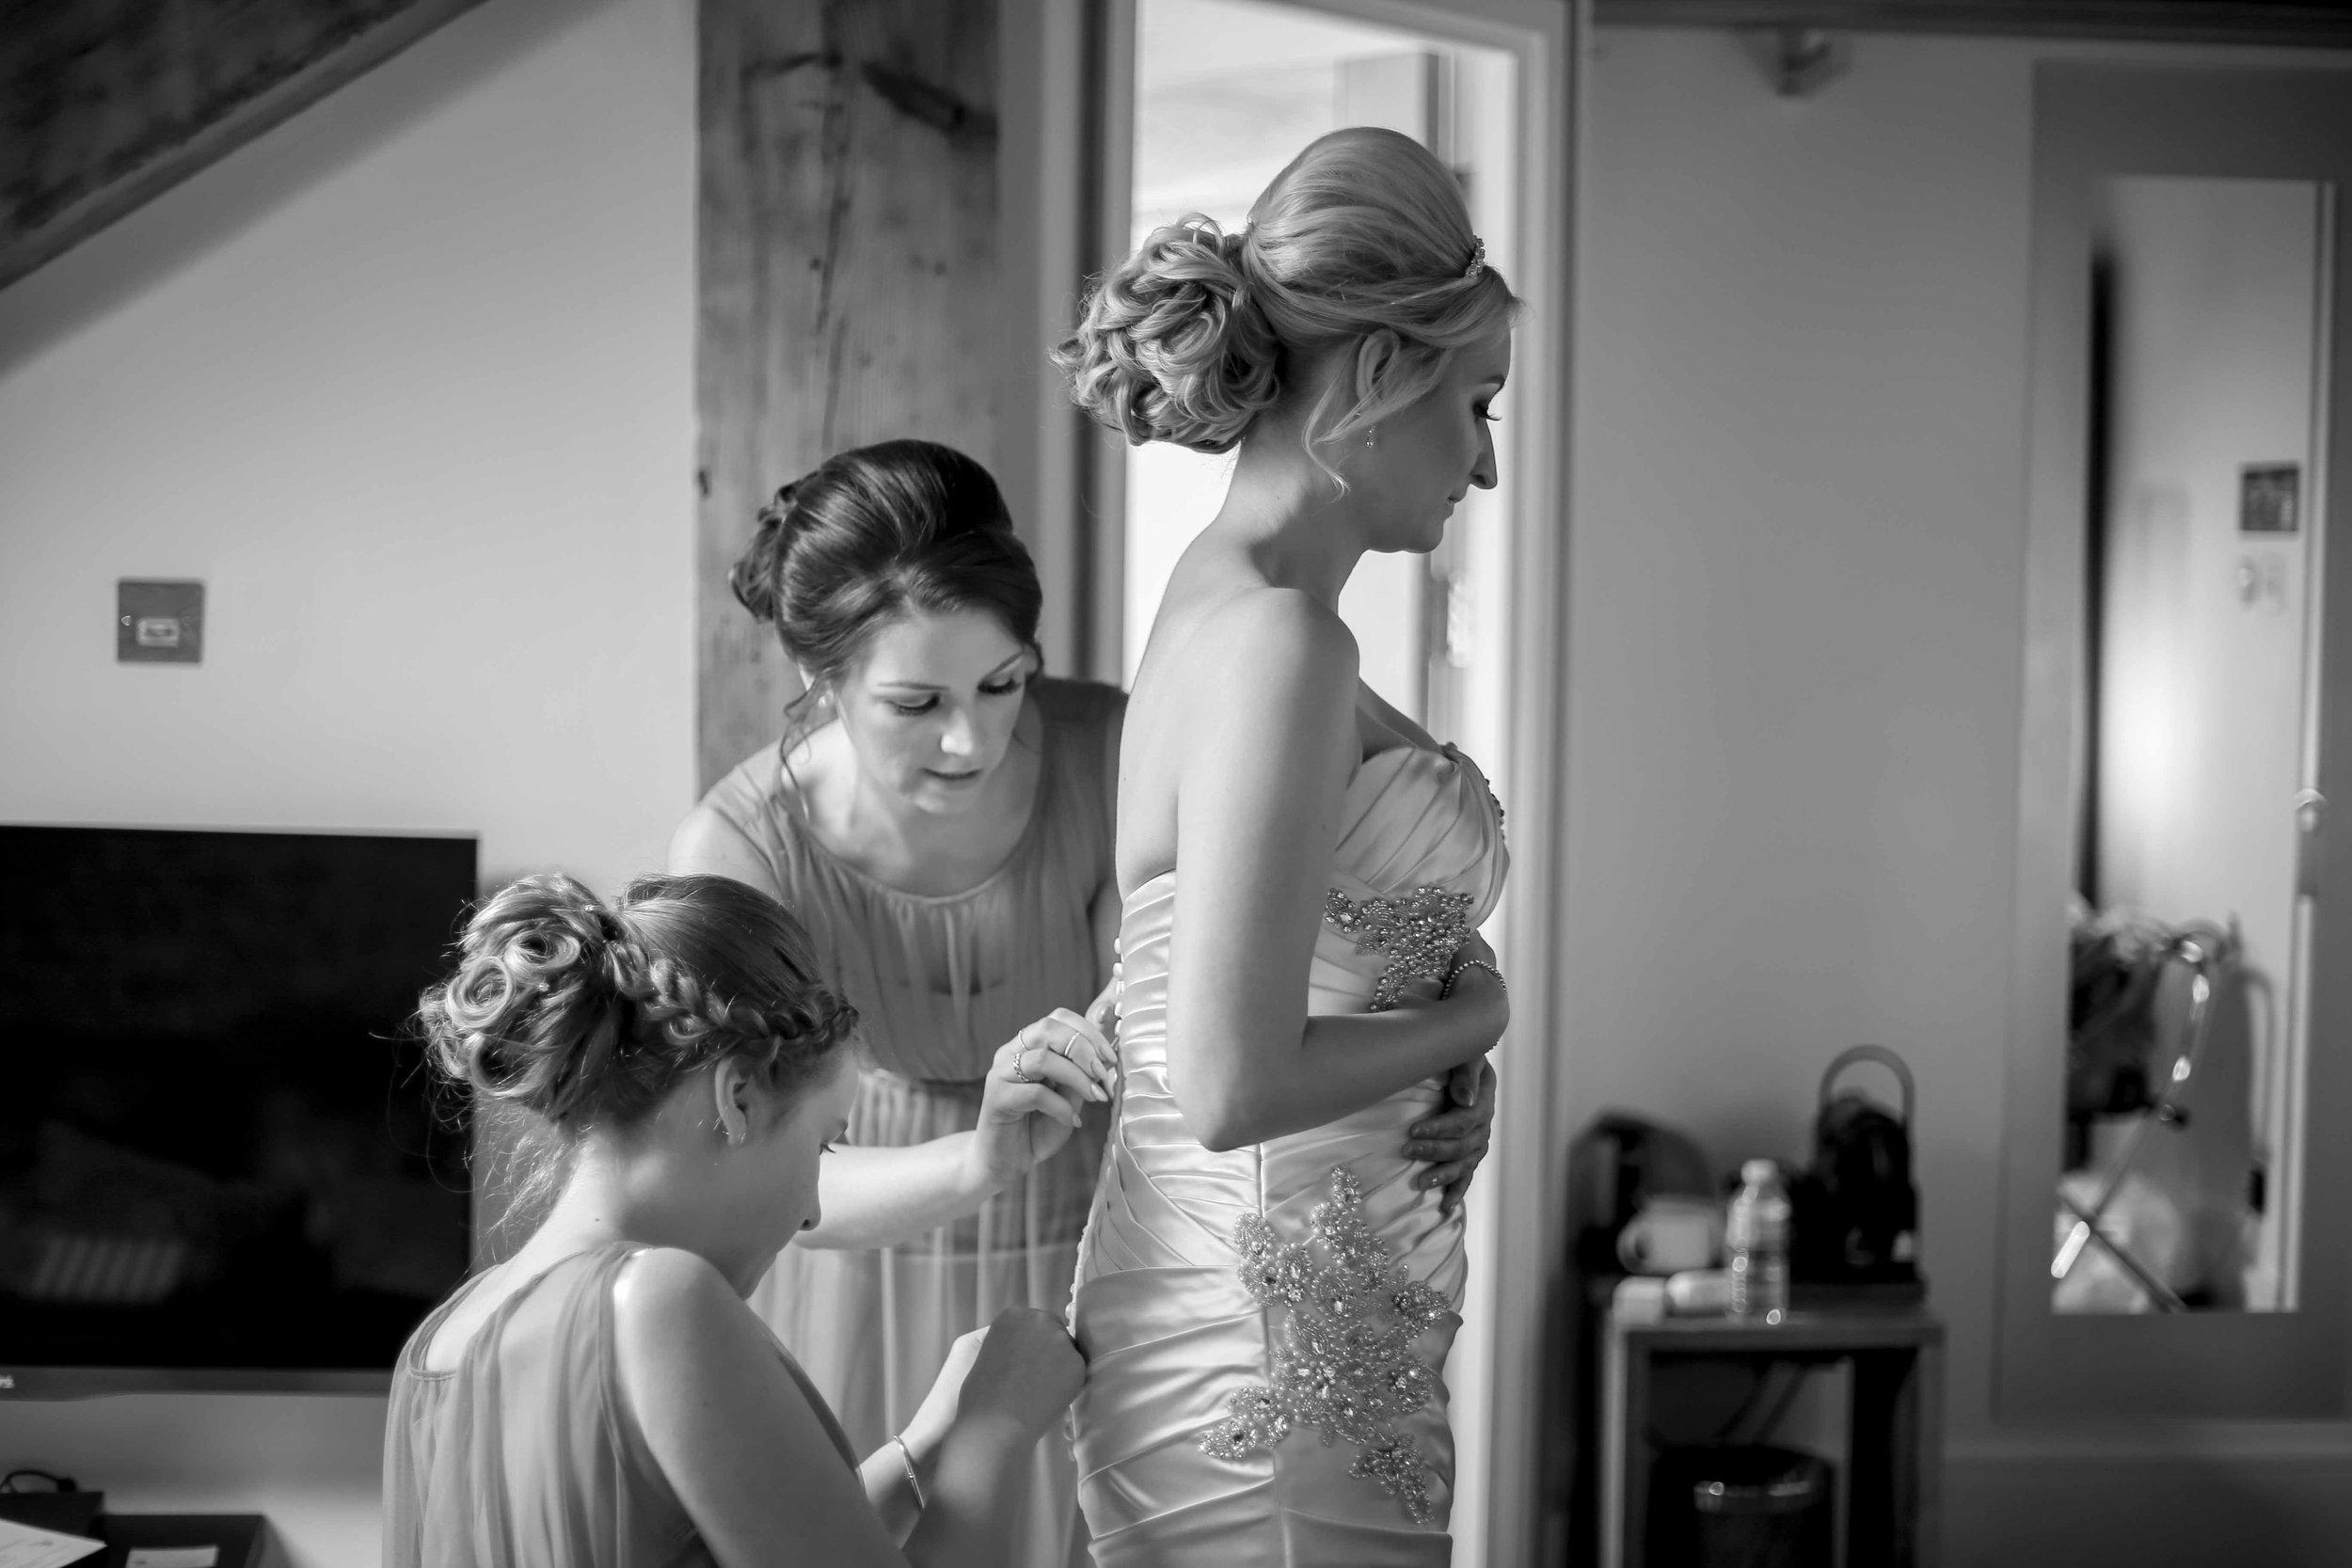 Wedding photos at the hope street hotel